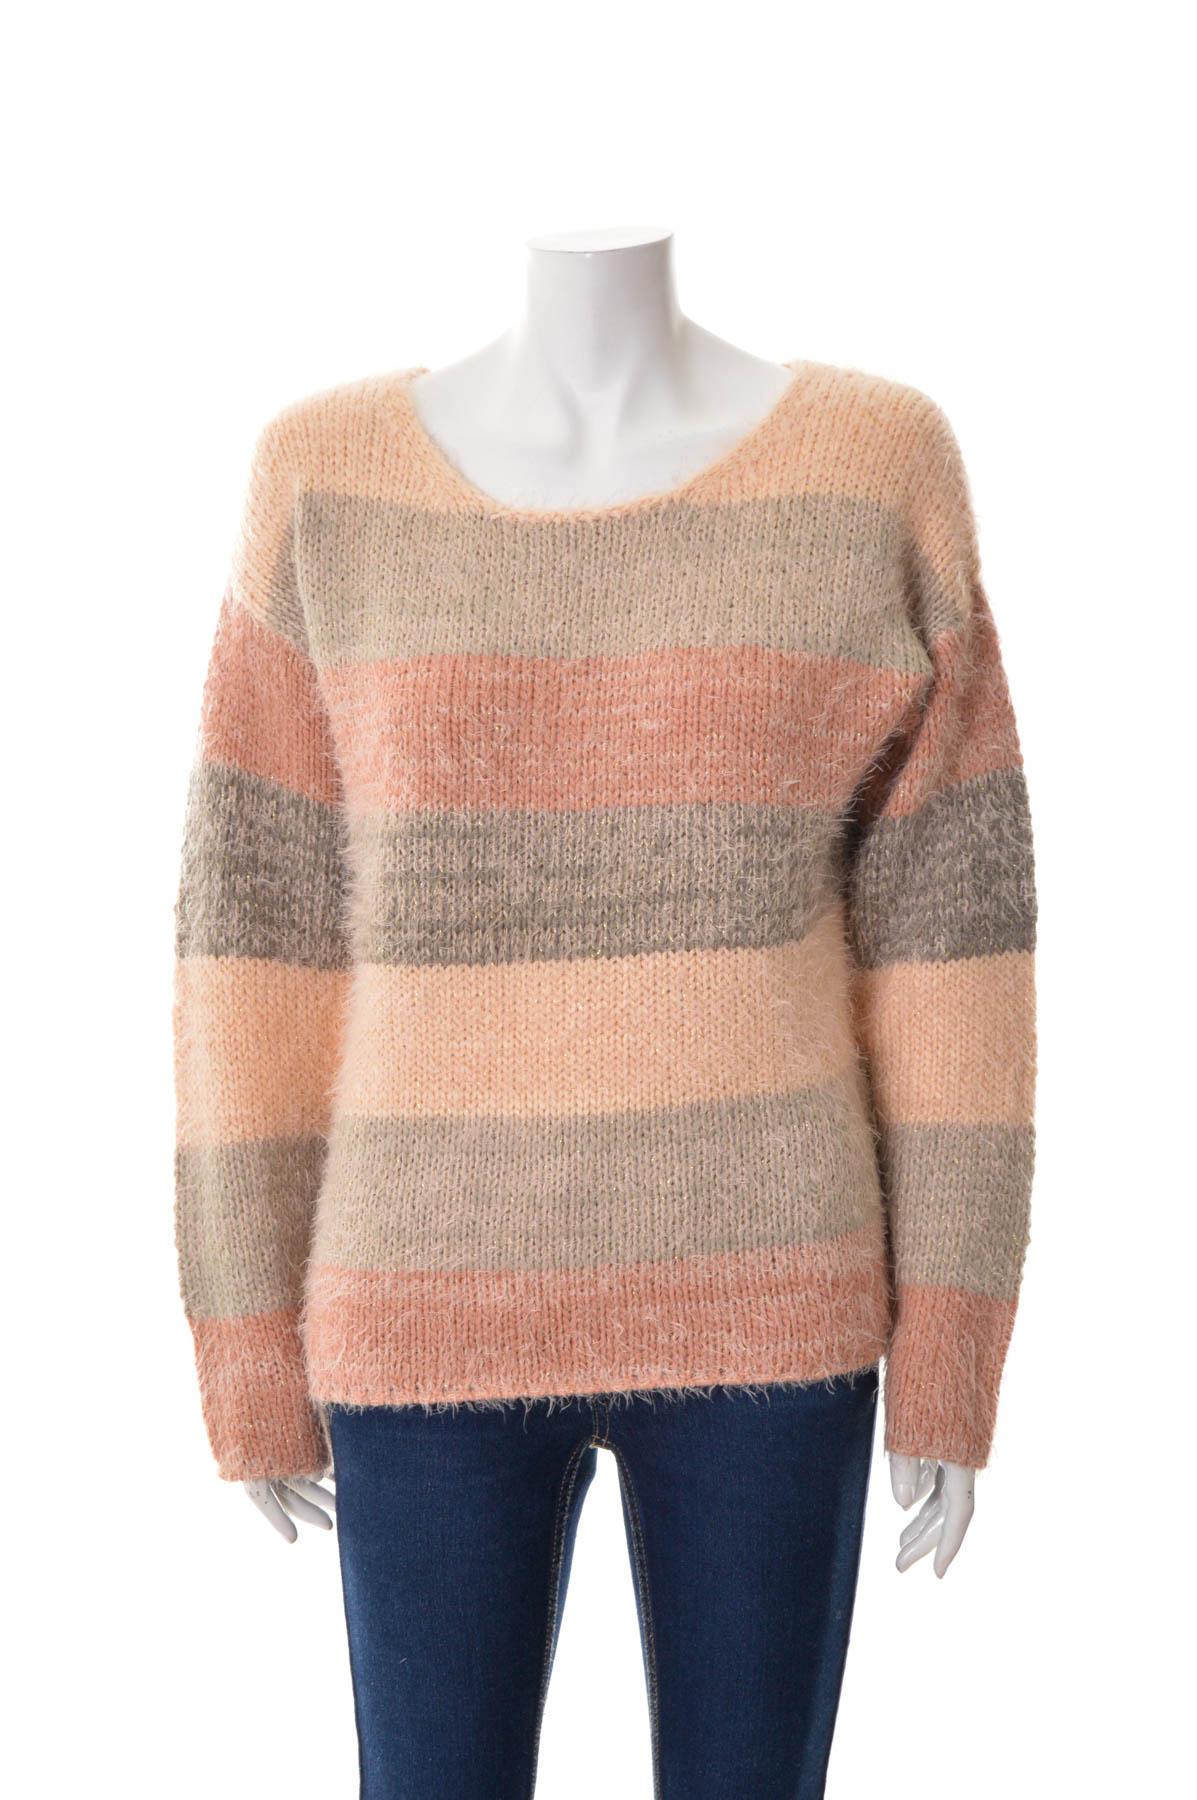 Women's sweater - Cami - 0